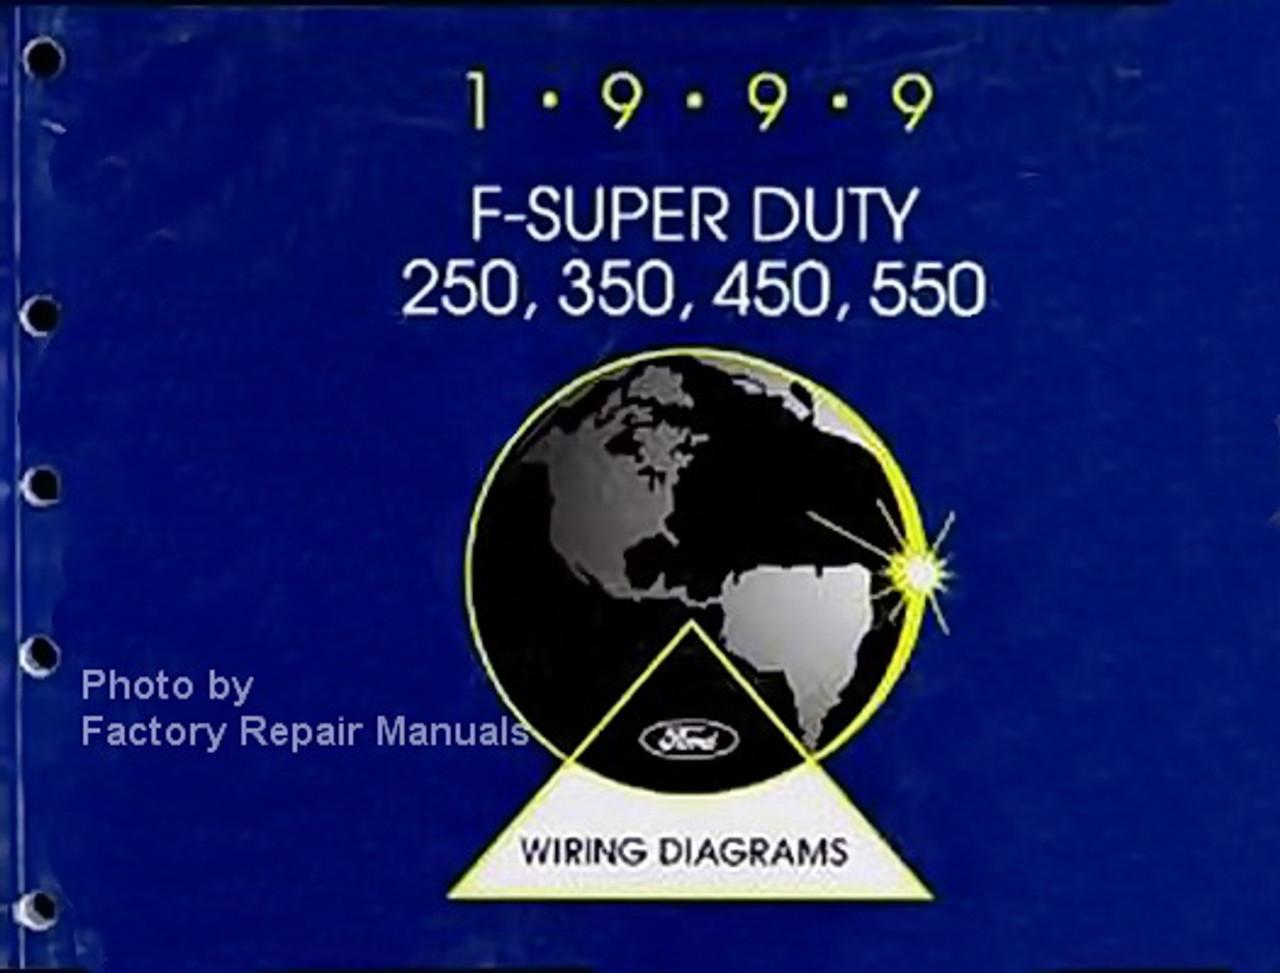 1999 Ford F250 F350 F450 F550 Super Duty Electrical Wiring Diagrams Ford F Wiring Diagram on